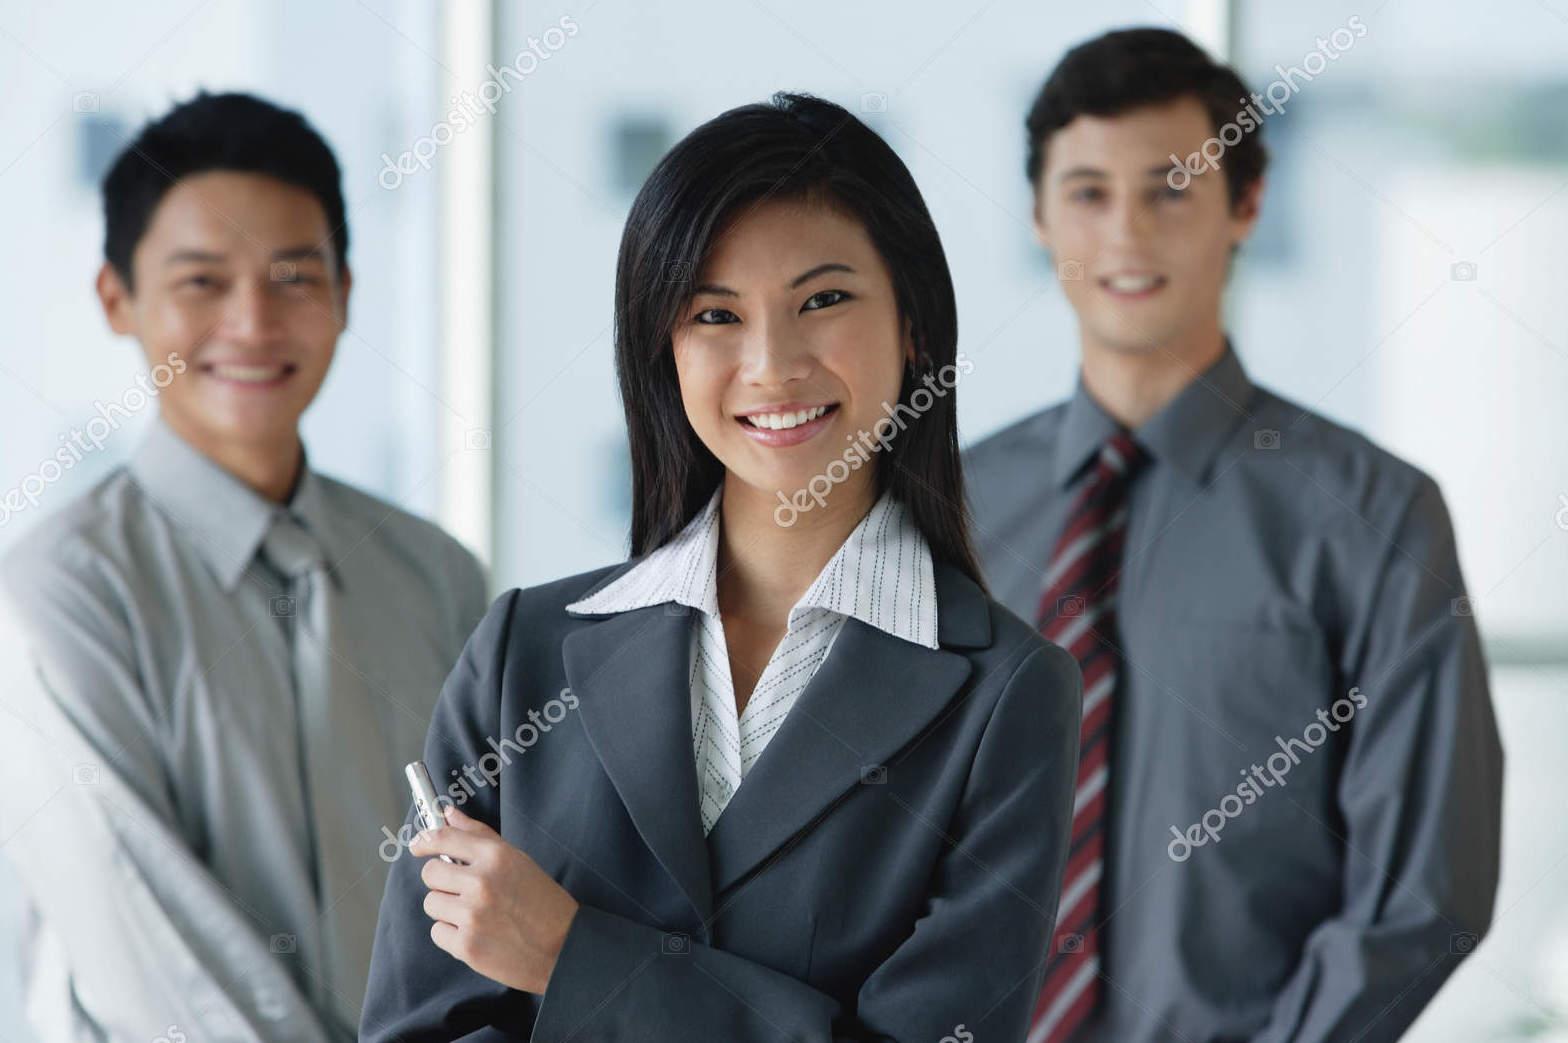 depositphotos_133525898-stock-photo-work-colleagues-smile.jpg